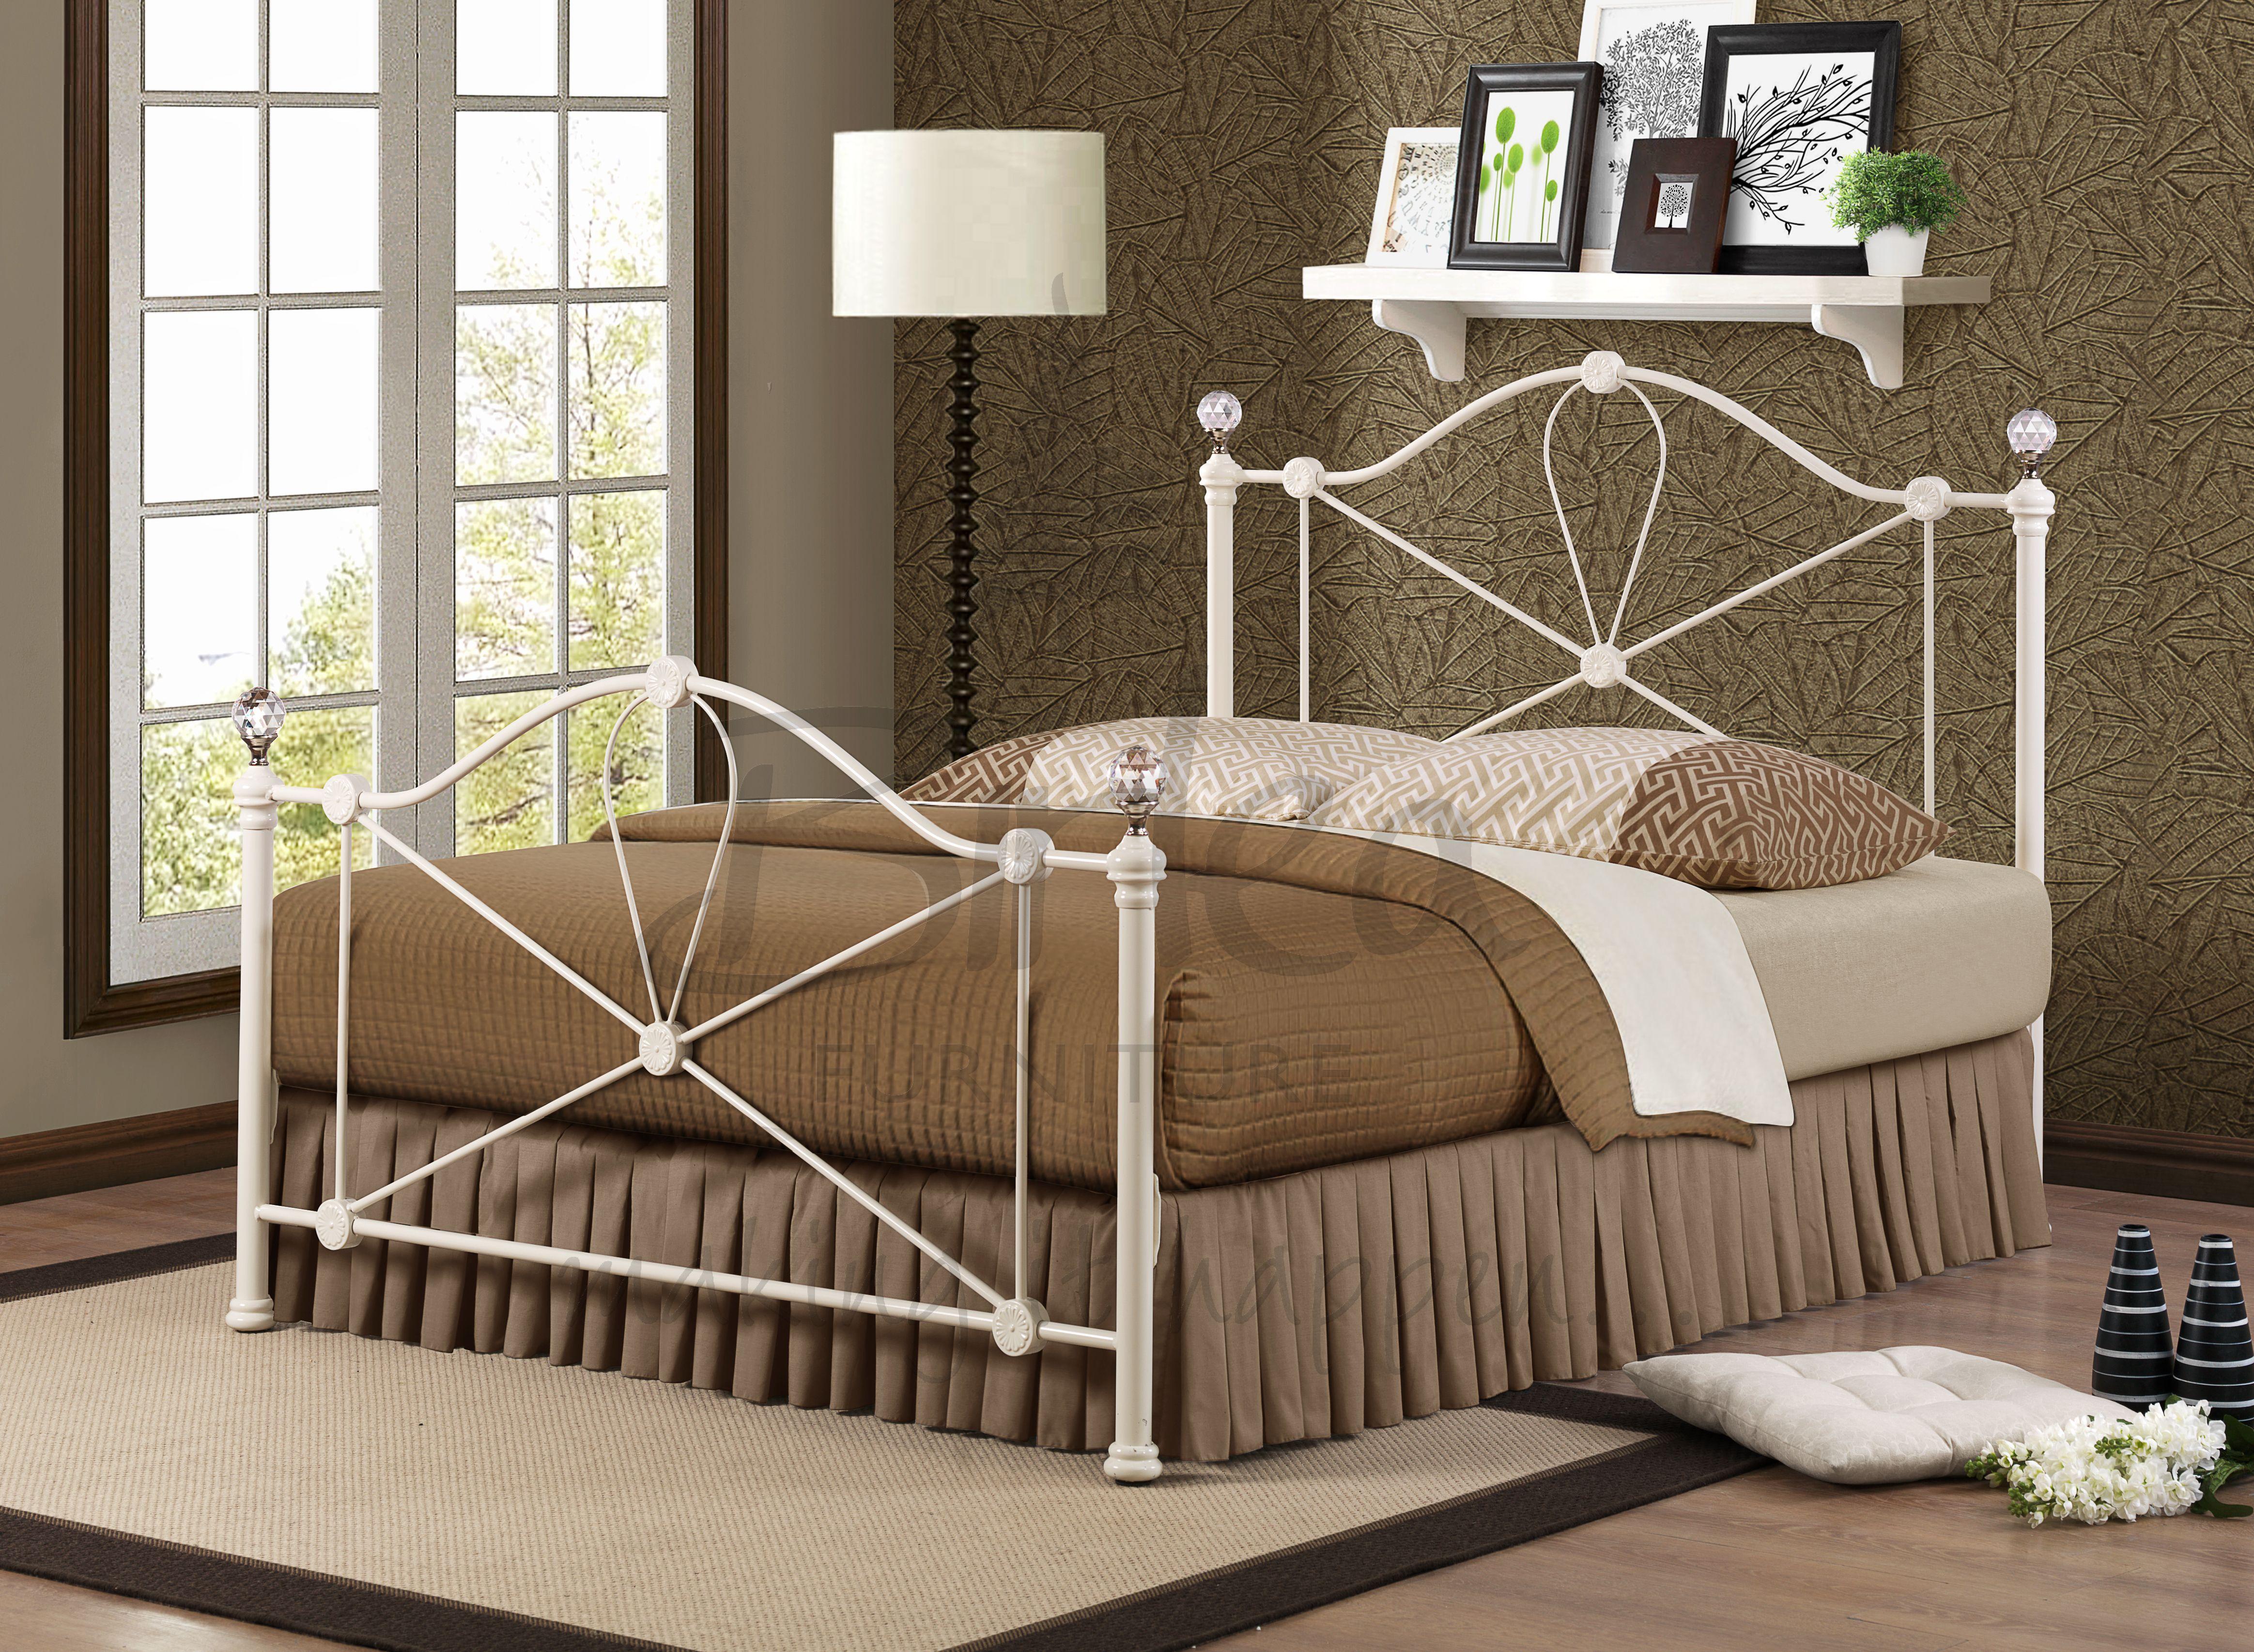 modern metal bed frames b5p0SL7F